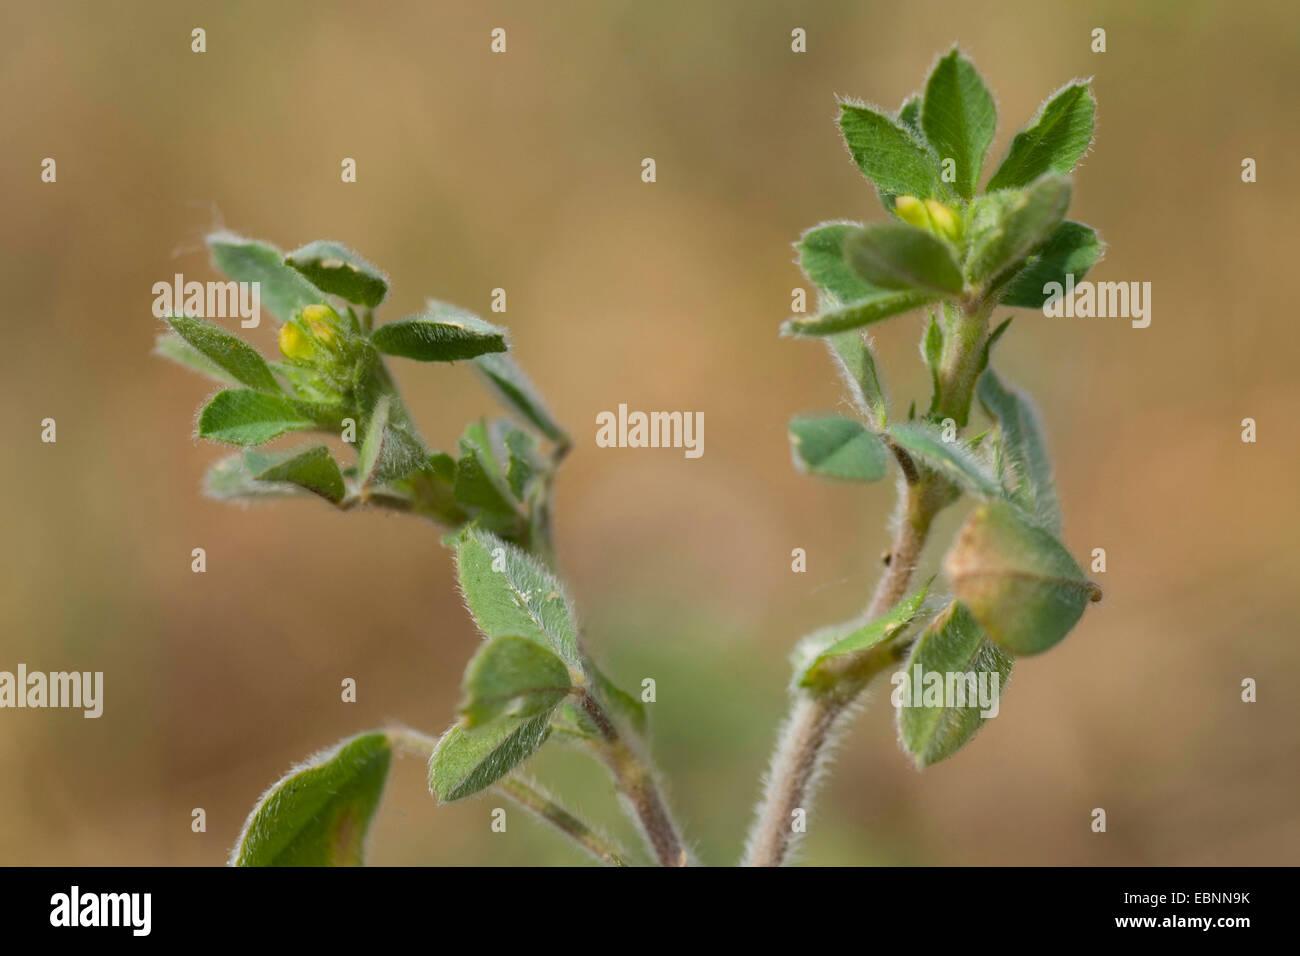 Bur medick, Little burclover (Medicago minima), in bud, Germany - Stock Image